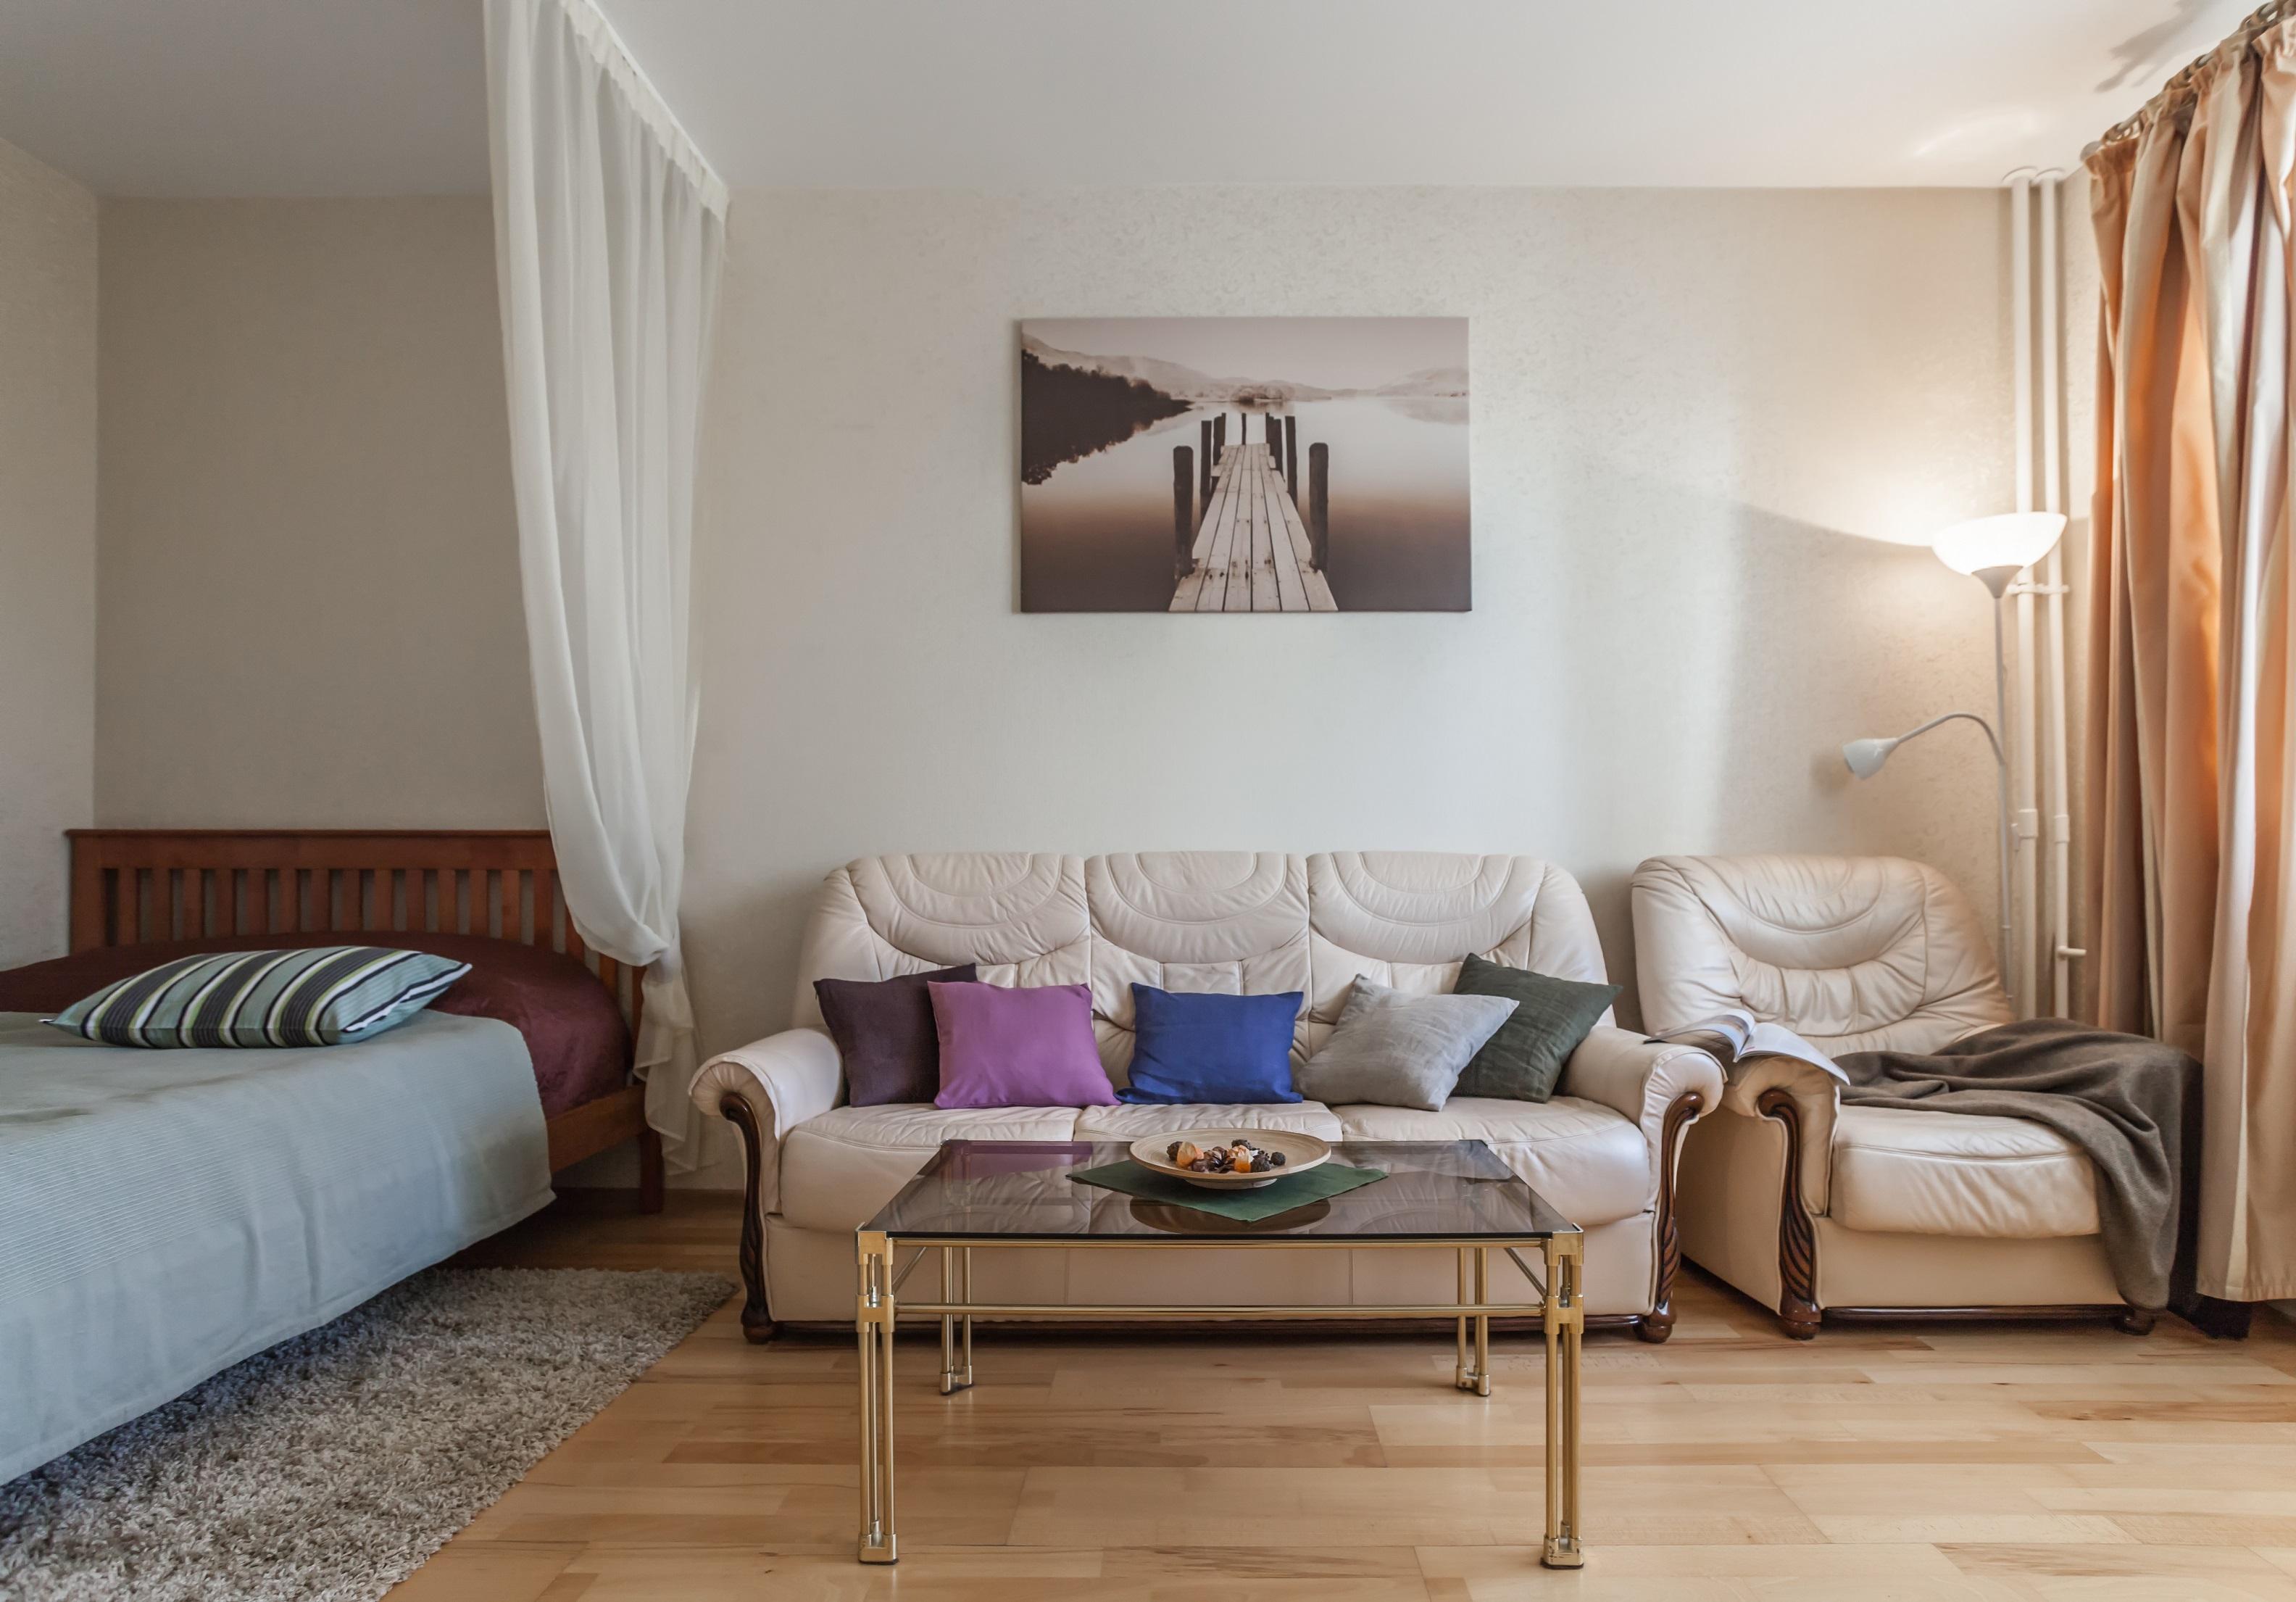 Дизайн квартиры с икеа фото сами